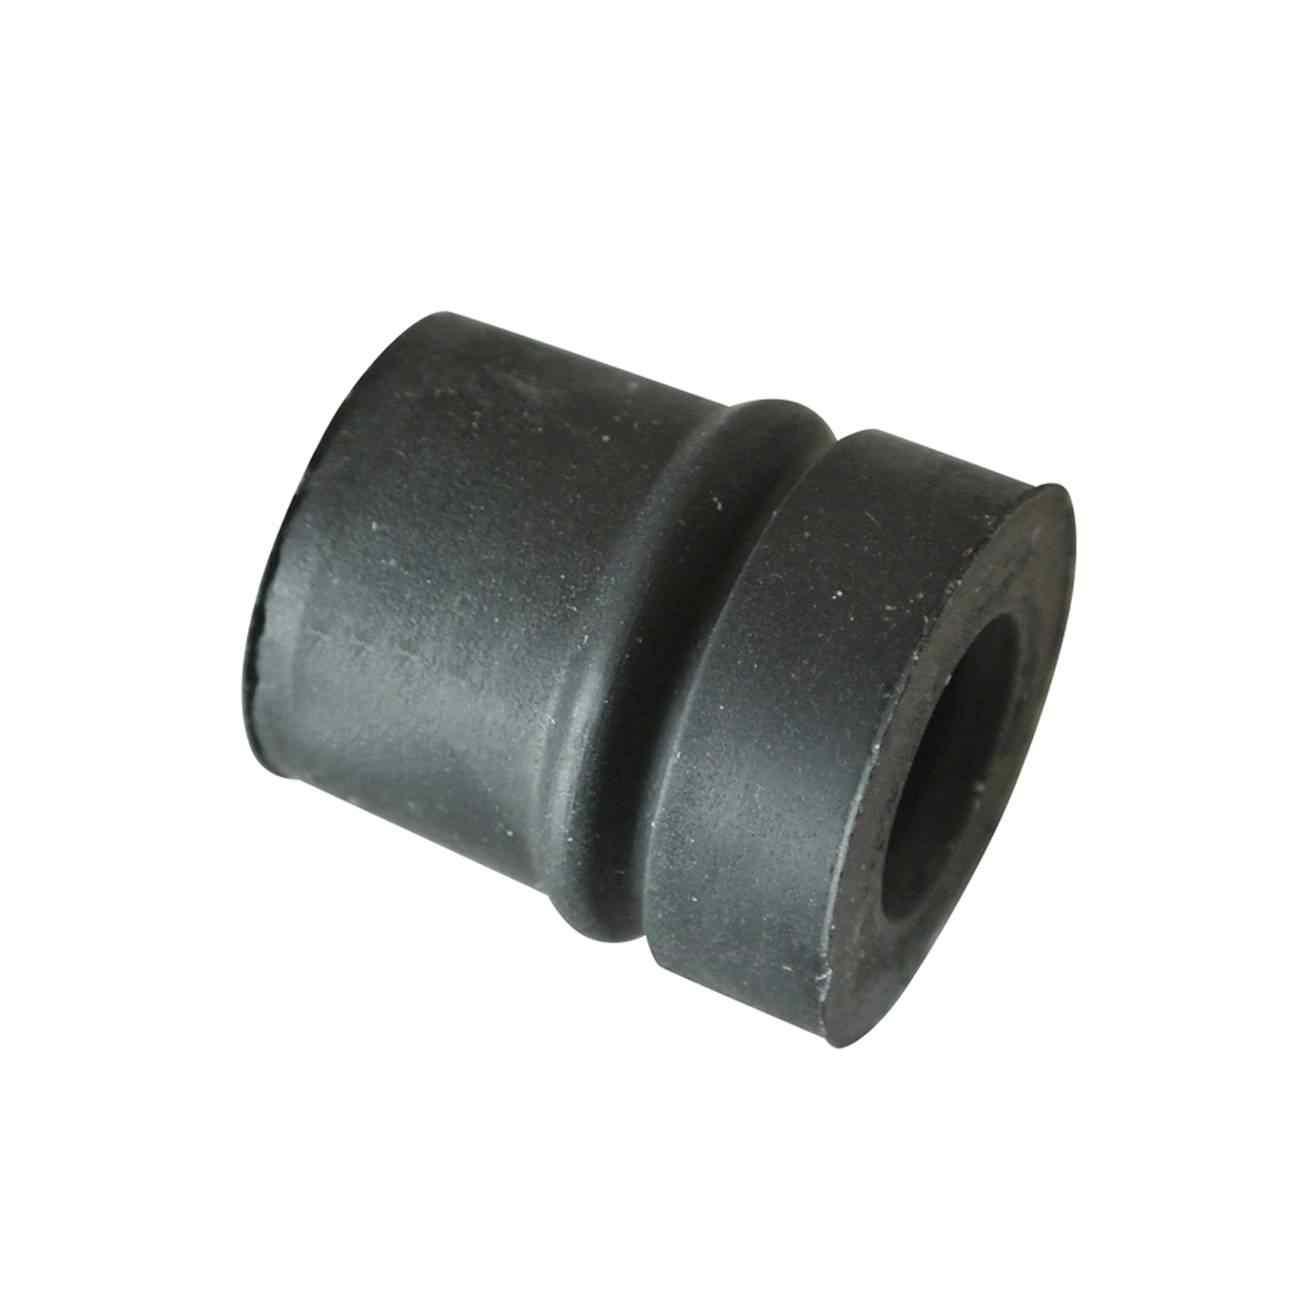 Ringvormige Buffer Voor STIHL 044 064 066 MS460 MS461 MS640 MS660 Kettingzaag